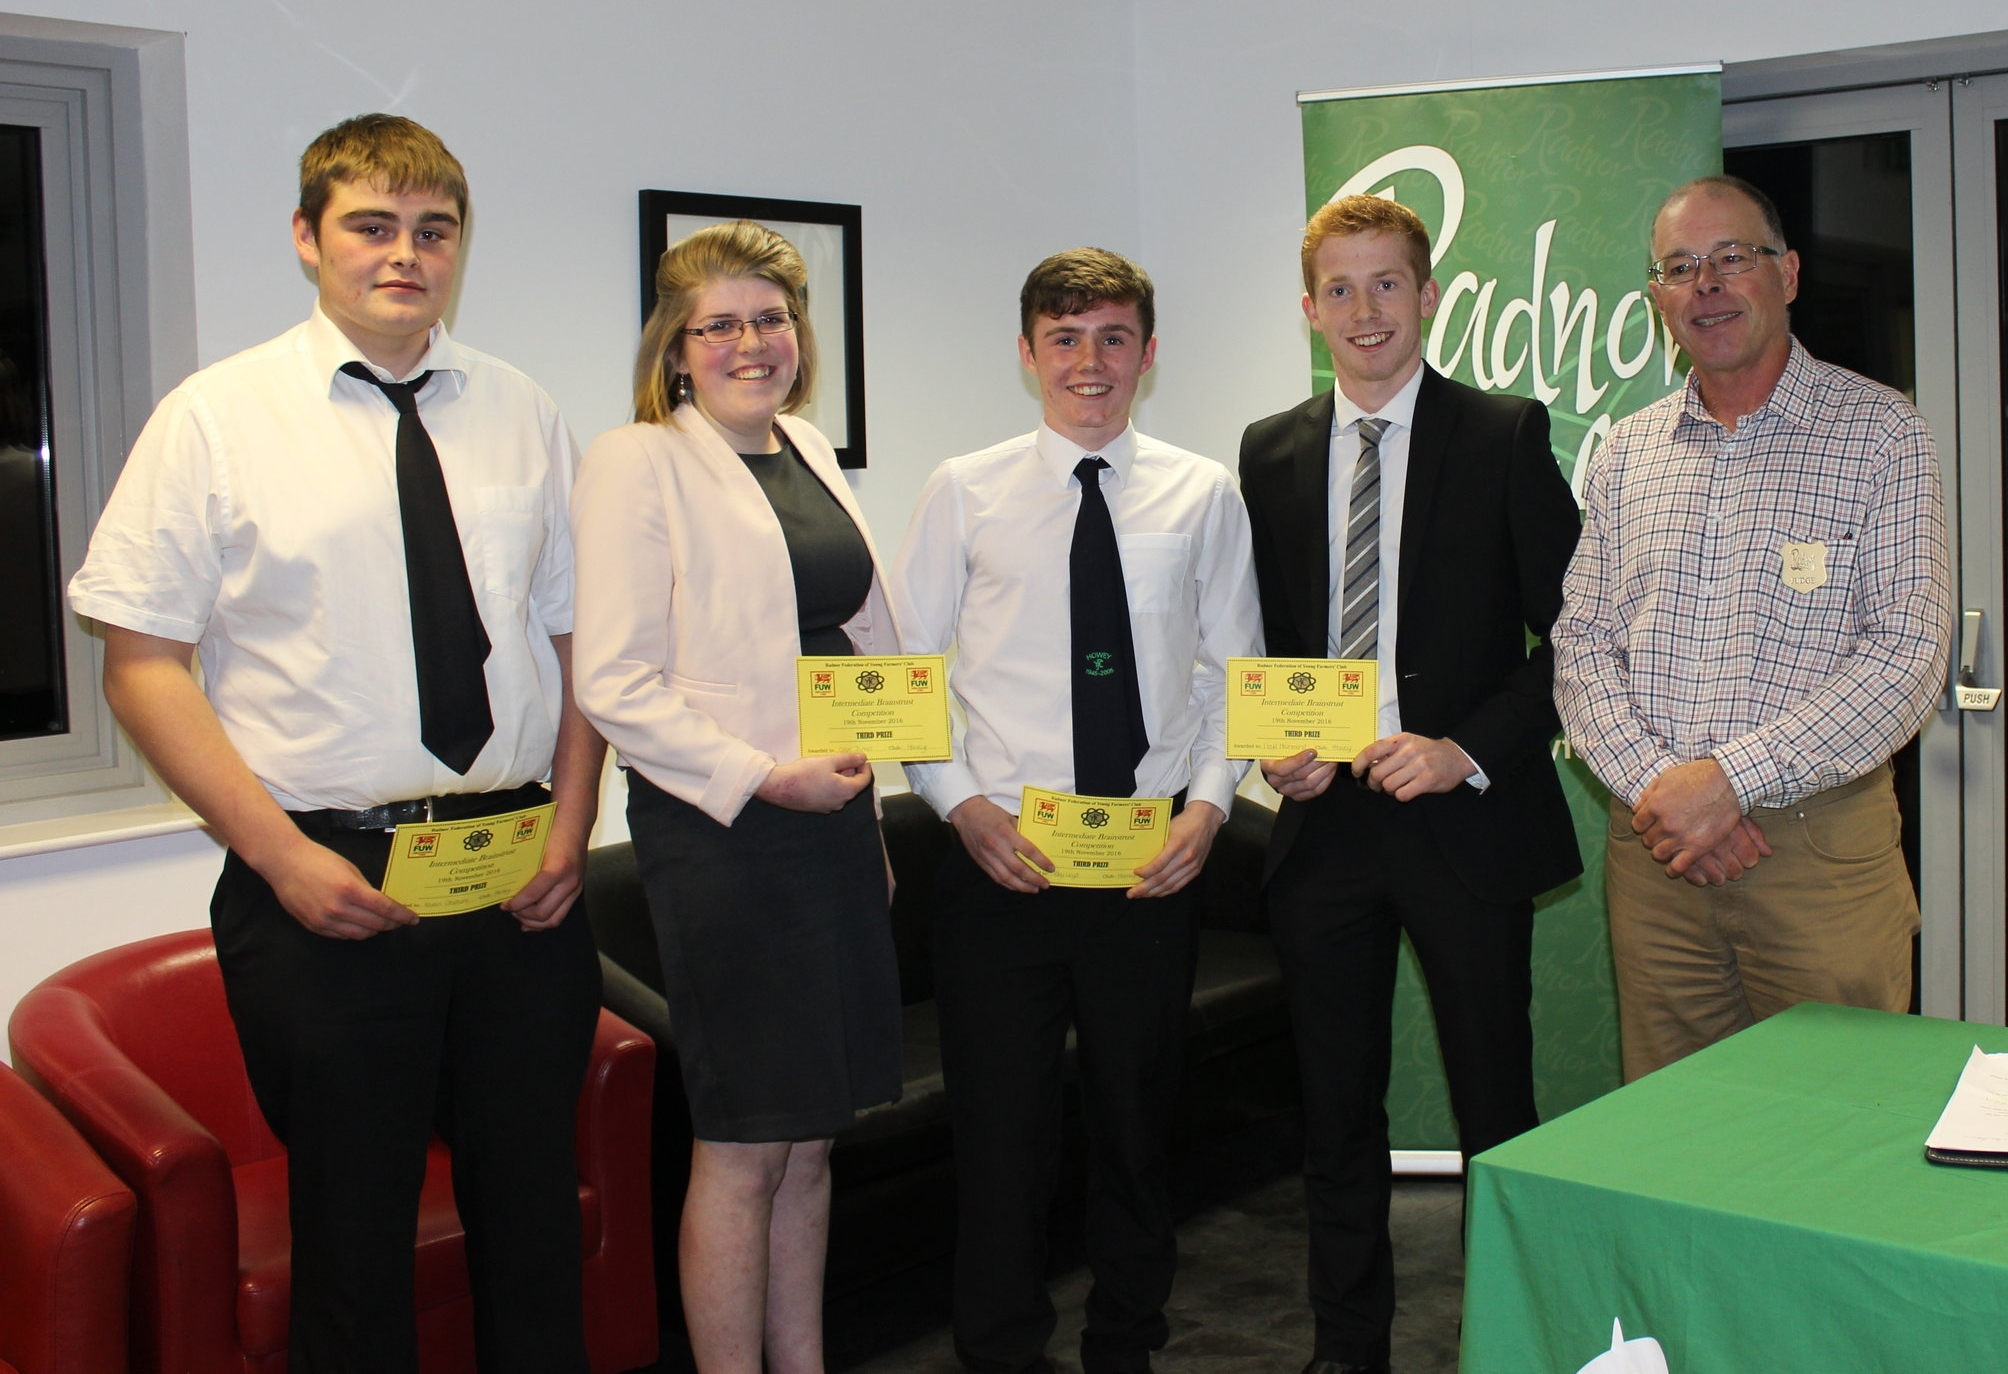 3rd Place Intermediate Brainstrust Ieuan Griffiths, Clare James, Toby Lloyd & Lloyd Hammond, Howey YFC with Judge Mr Ifor Humpreys.